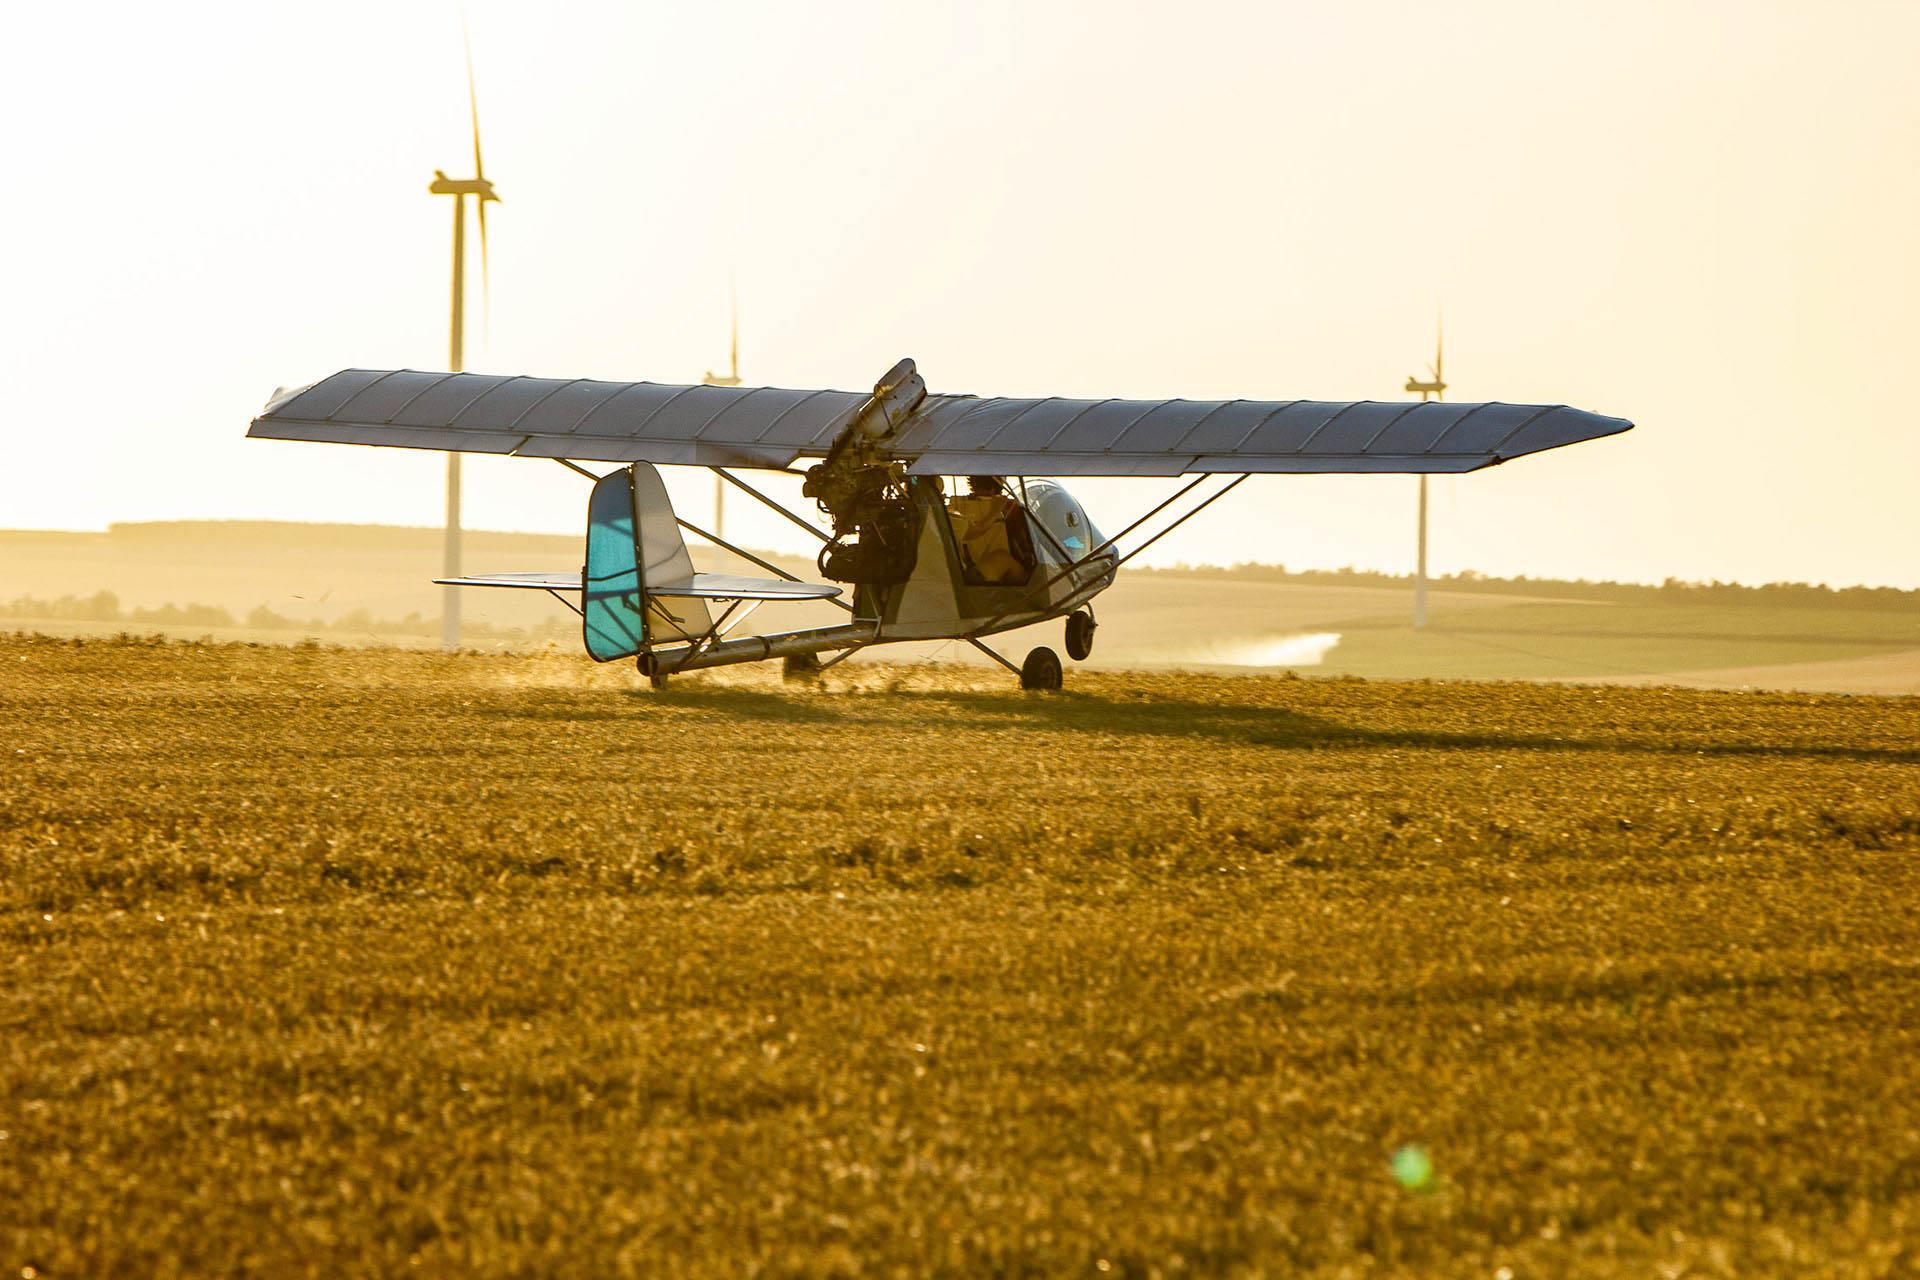 Aeronautique Ulm – Agnes Briand Photographe